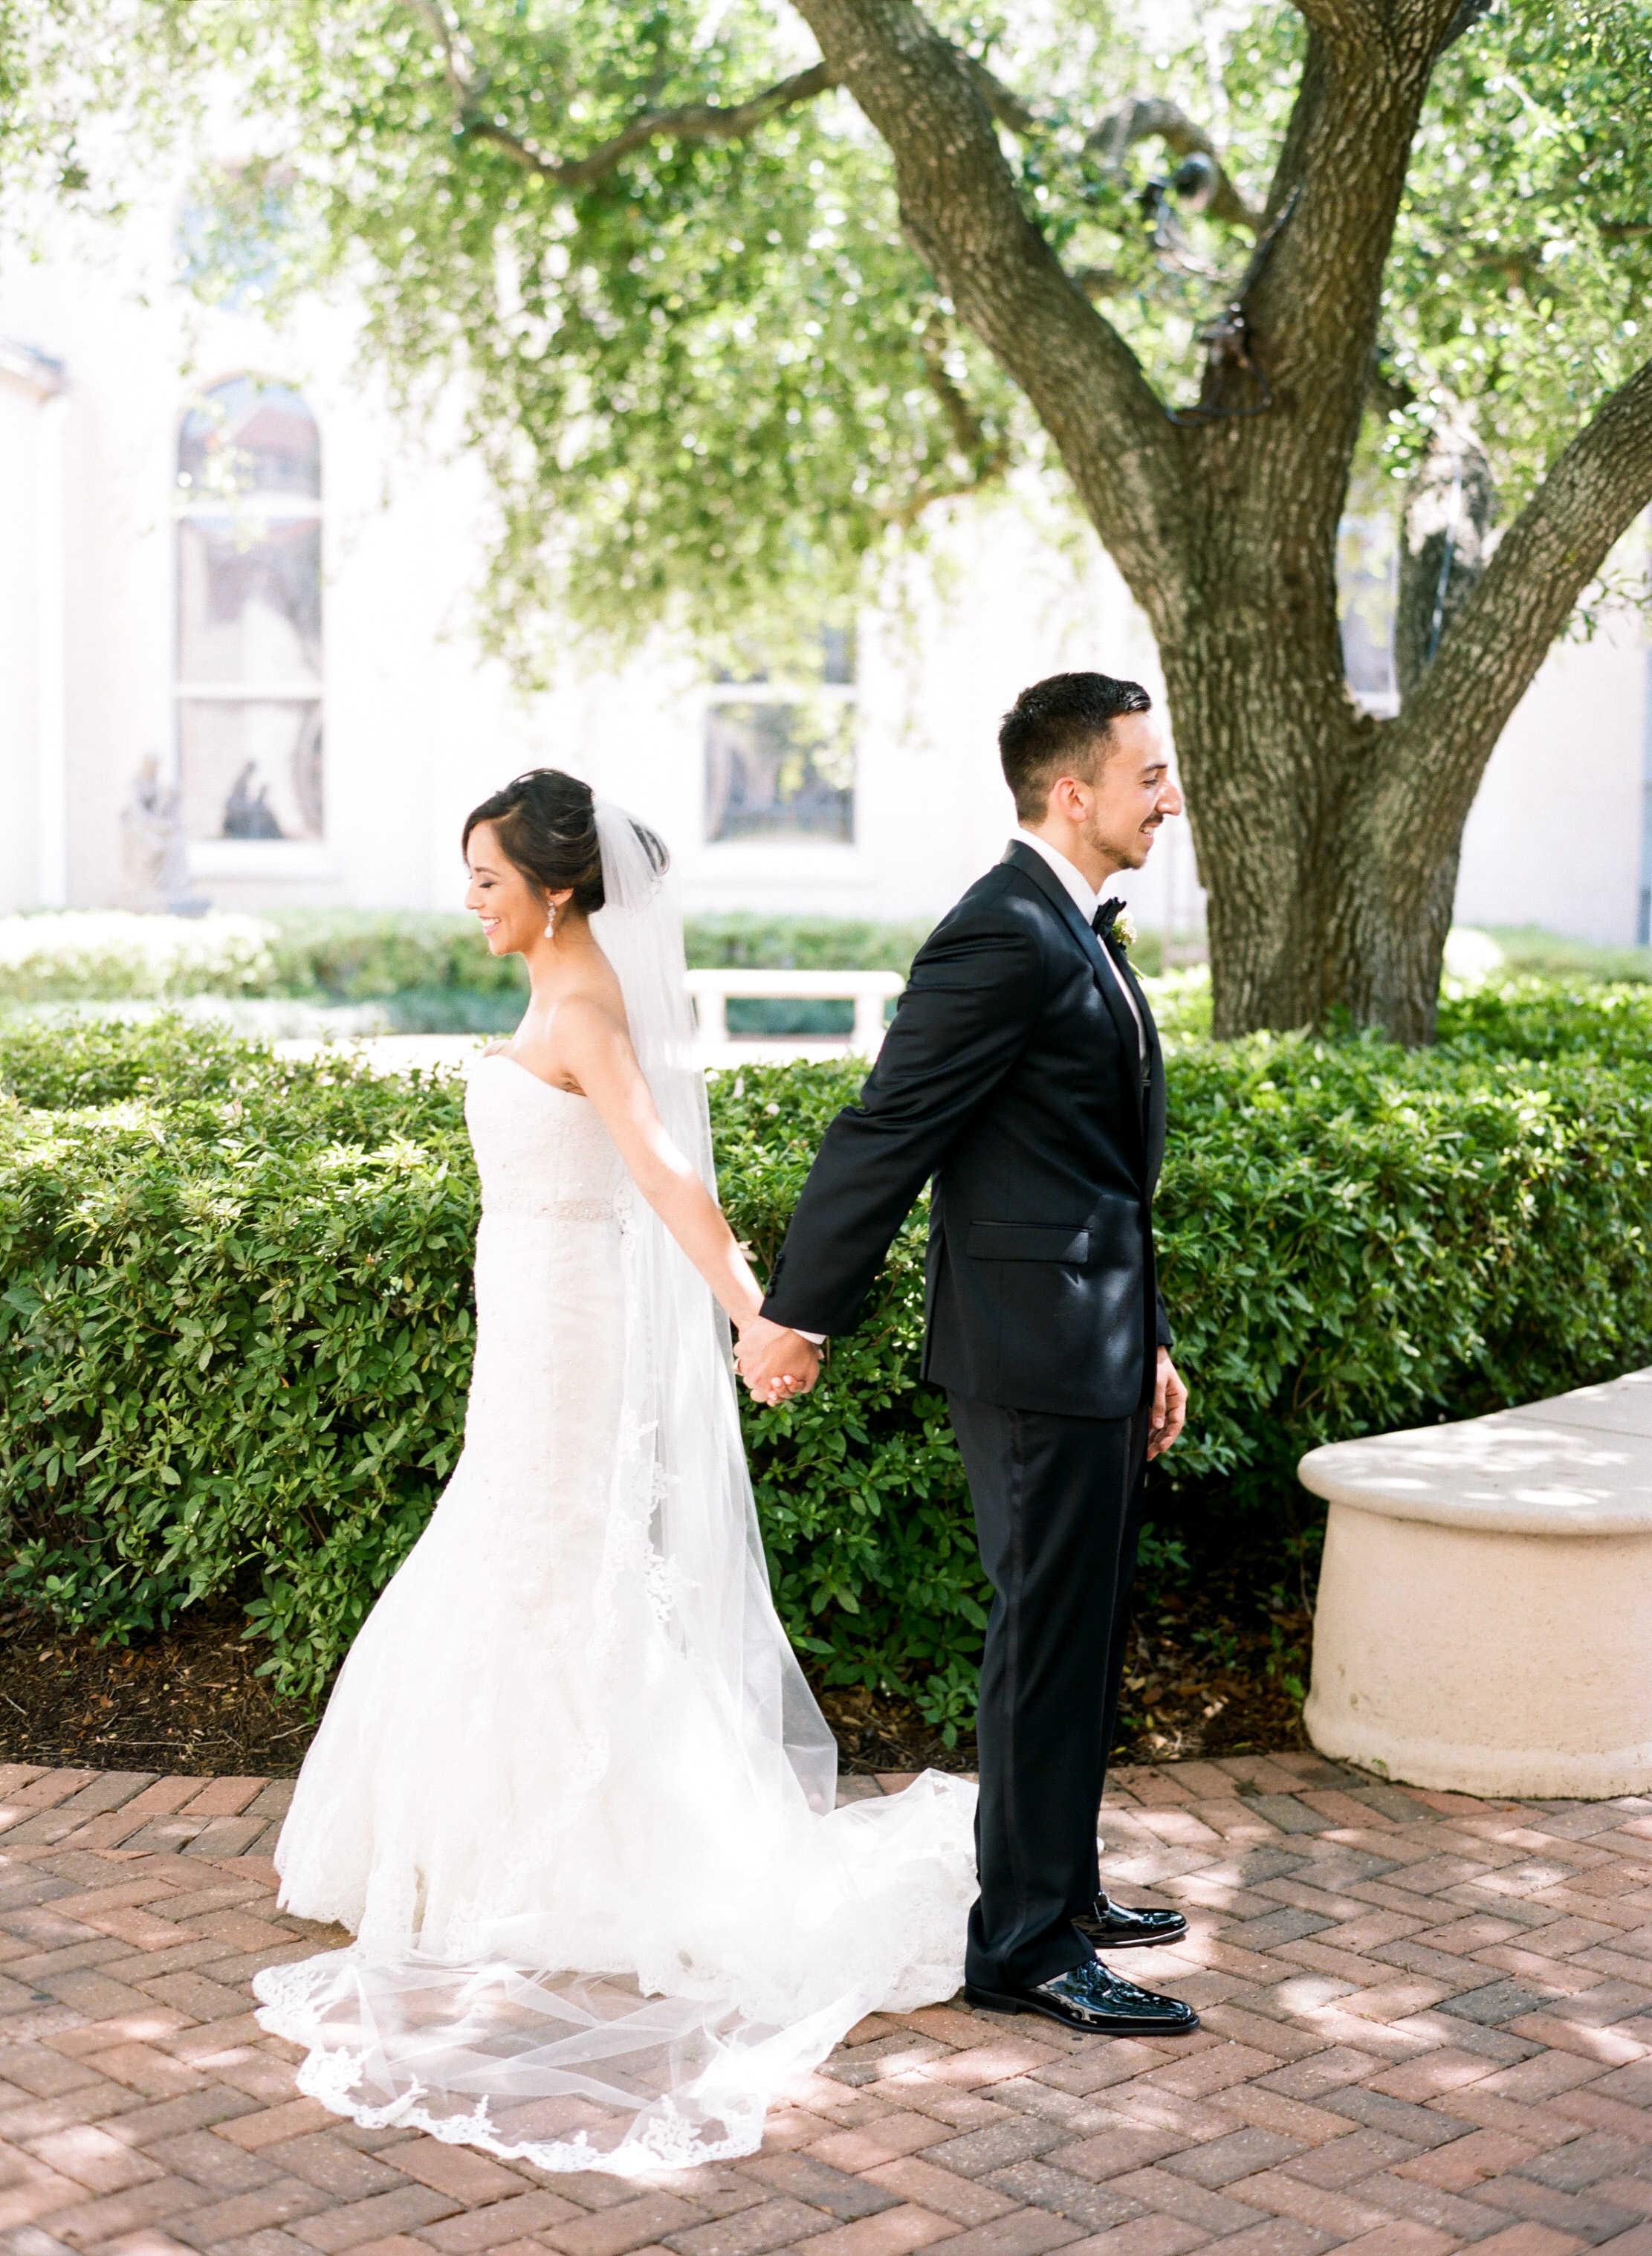 Houston-Wedding-Photography-St.-Anne-Catholic-Church-Houston-Wedding-The-Bell-Tower-on-34th-reception-wedding-film-14.jpg